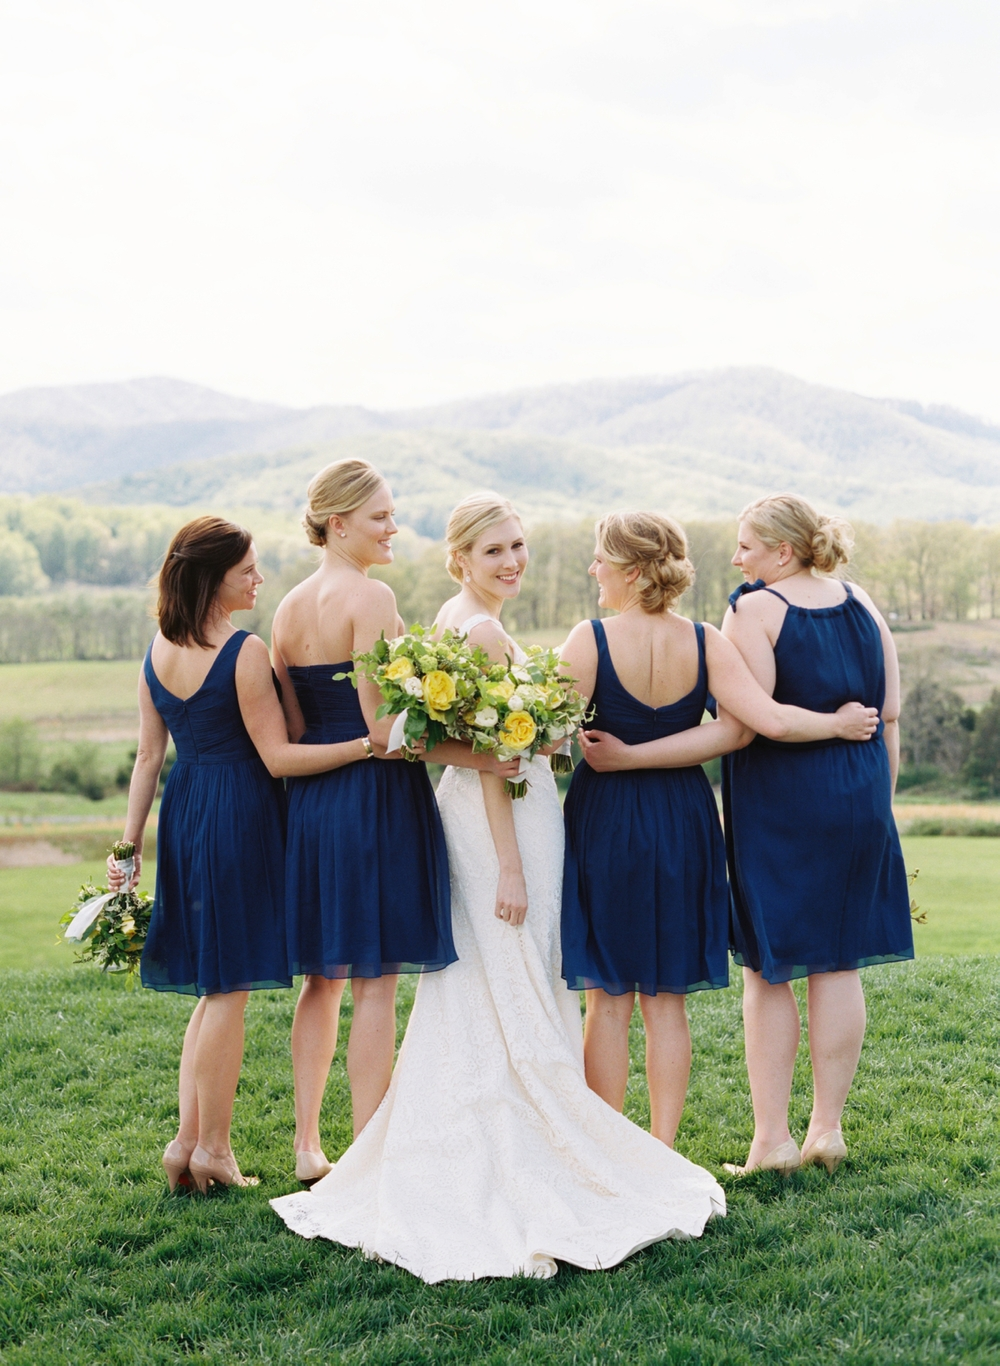 blue-yellow-wedding-dress-bridesmaids